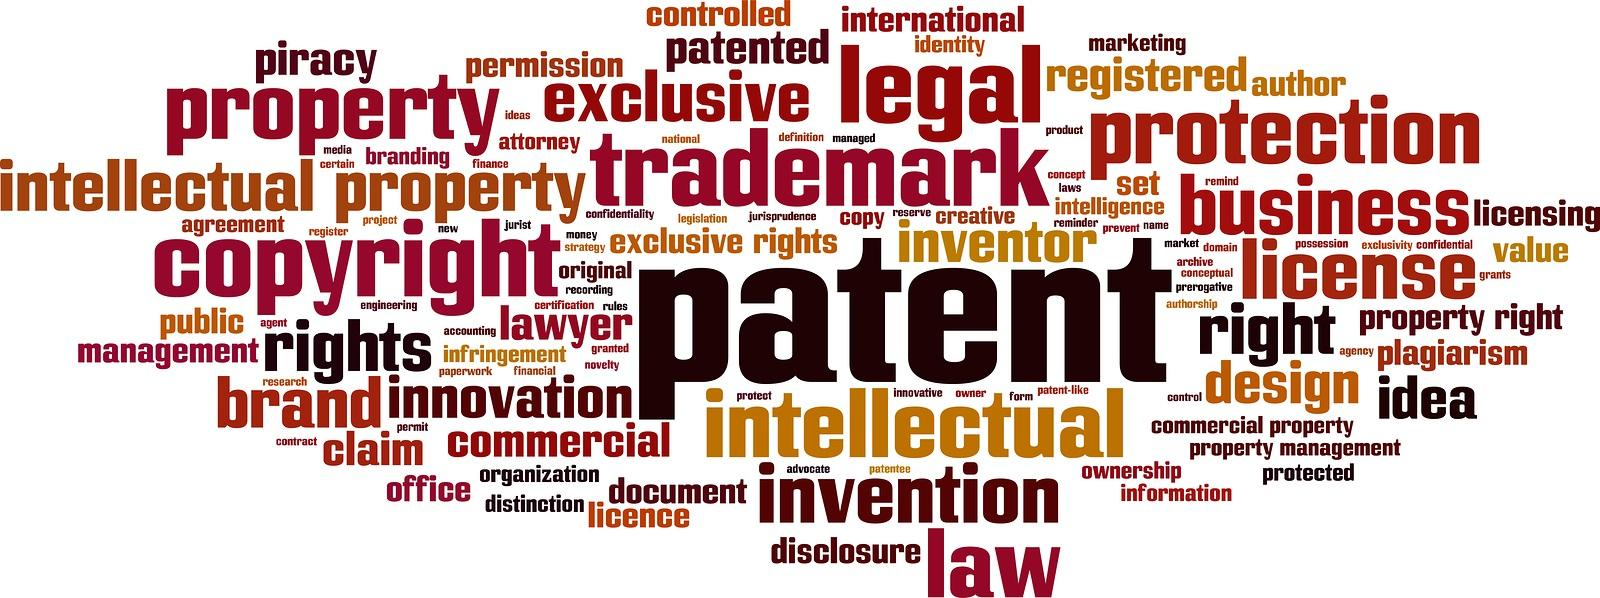 Legal Advantage, LLC - Patent Illustrations & Patent Search image 2